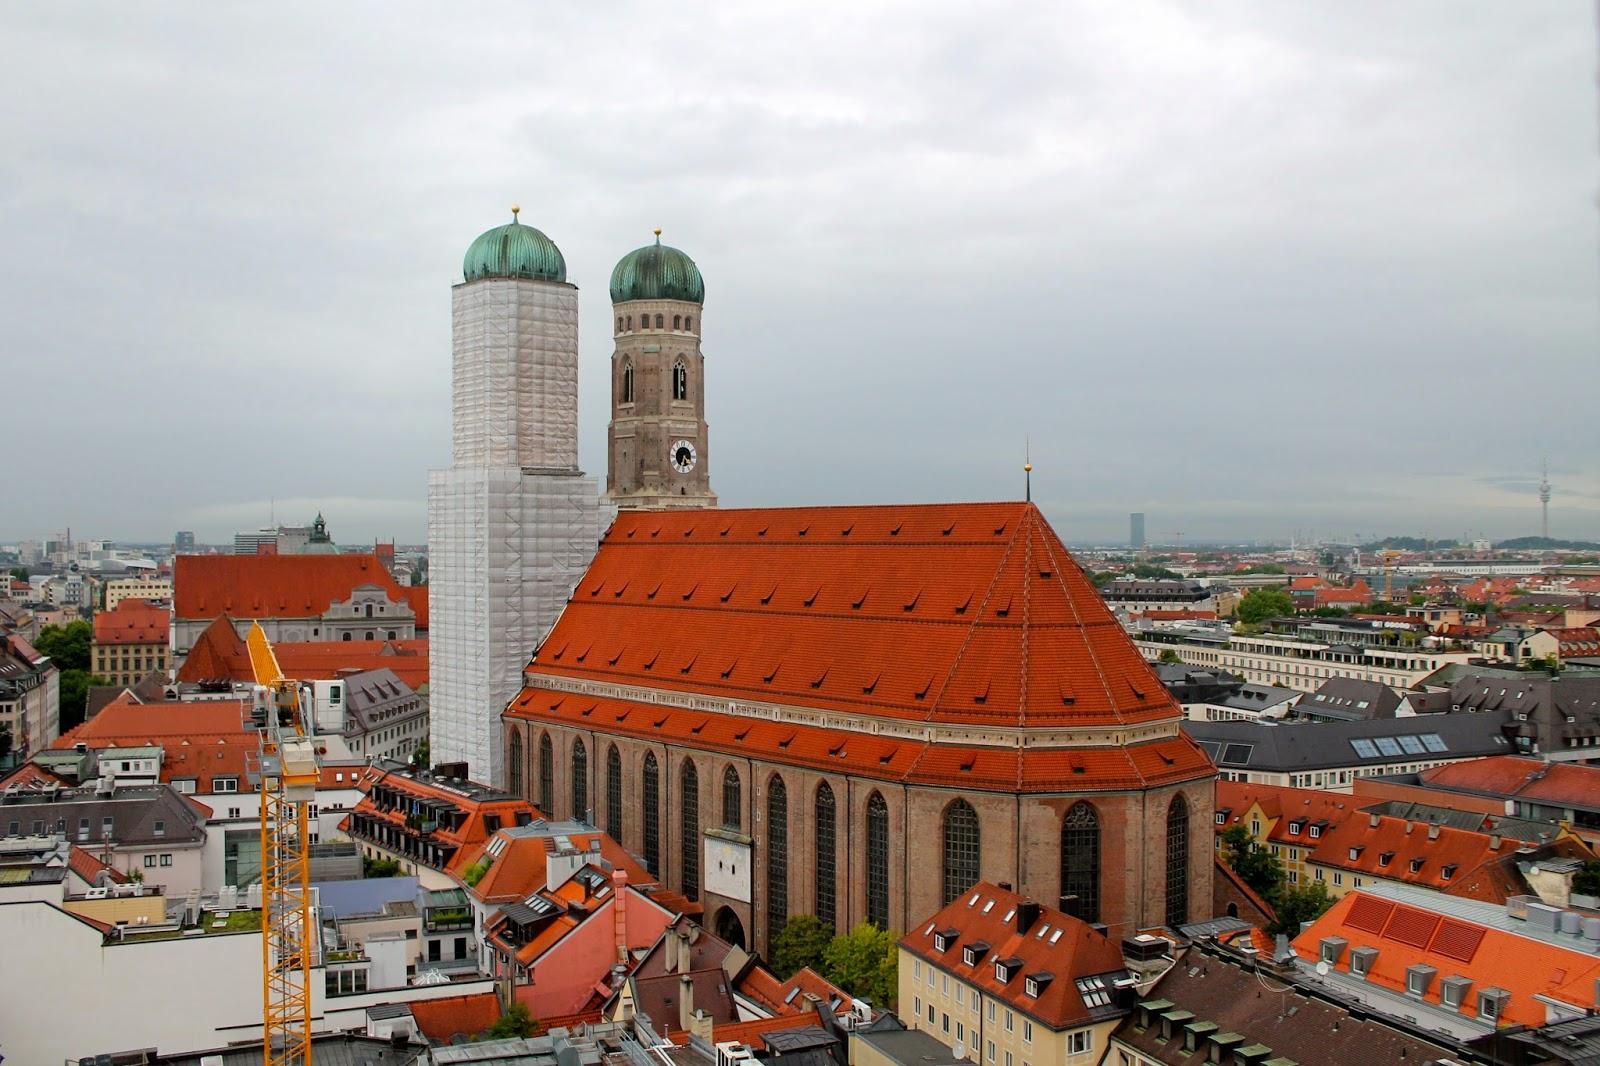 Frauenkirche, la catedral de Munich. ¡Munich! en Hitzen Mundua